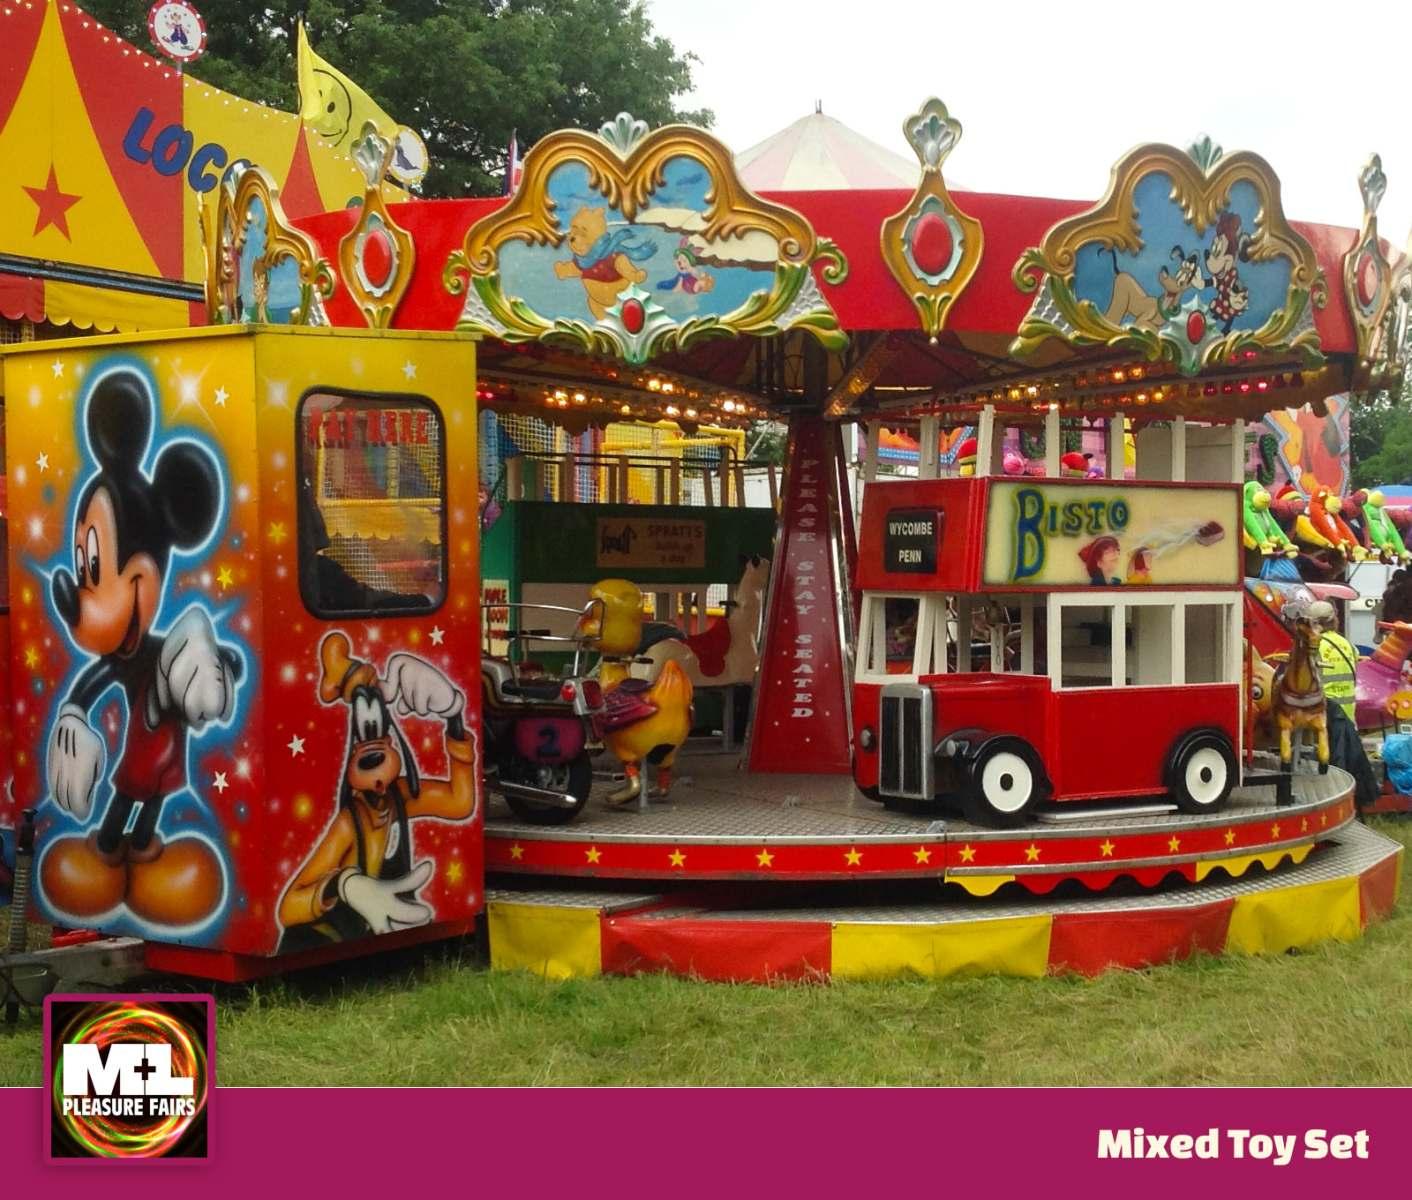 Mixed Toy Set Ride